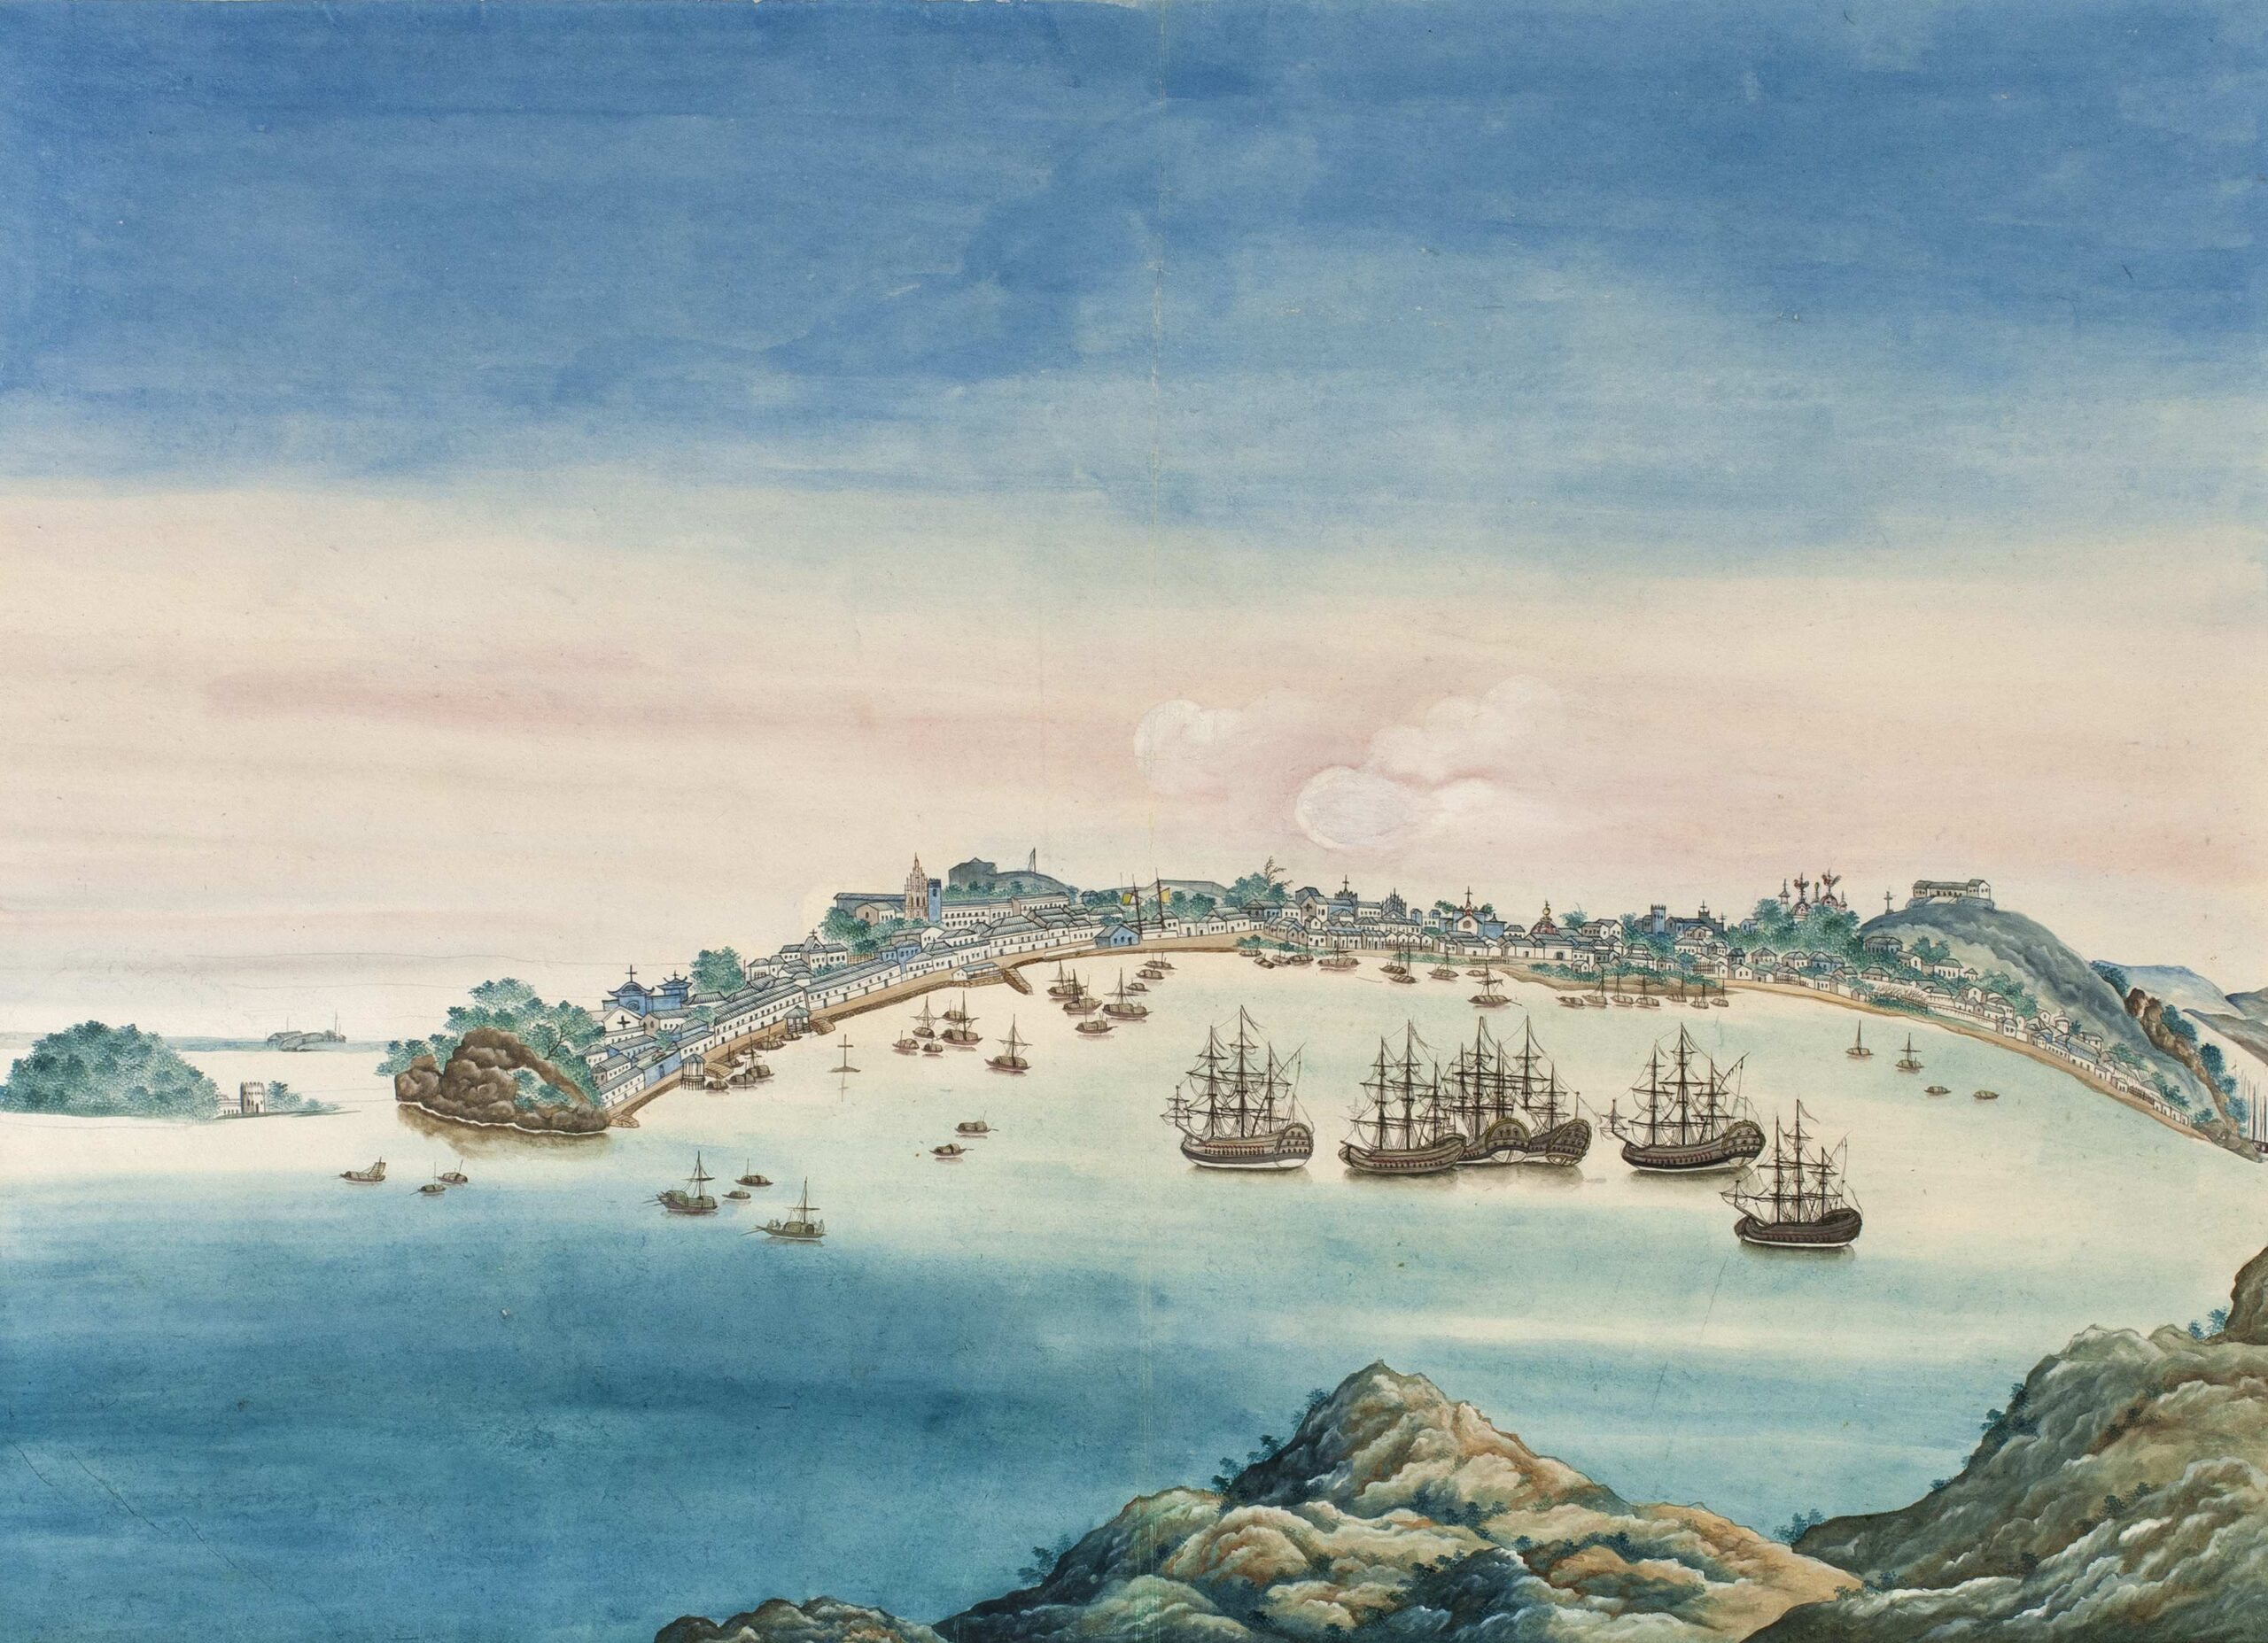 Chinese artist, c. 1770 Macau: the inner harbour Gouache, 15 3/4 x 22 1/2 in (40 x 56.6 cm)